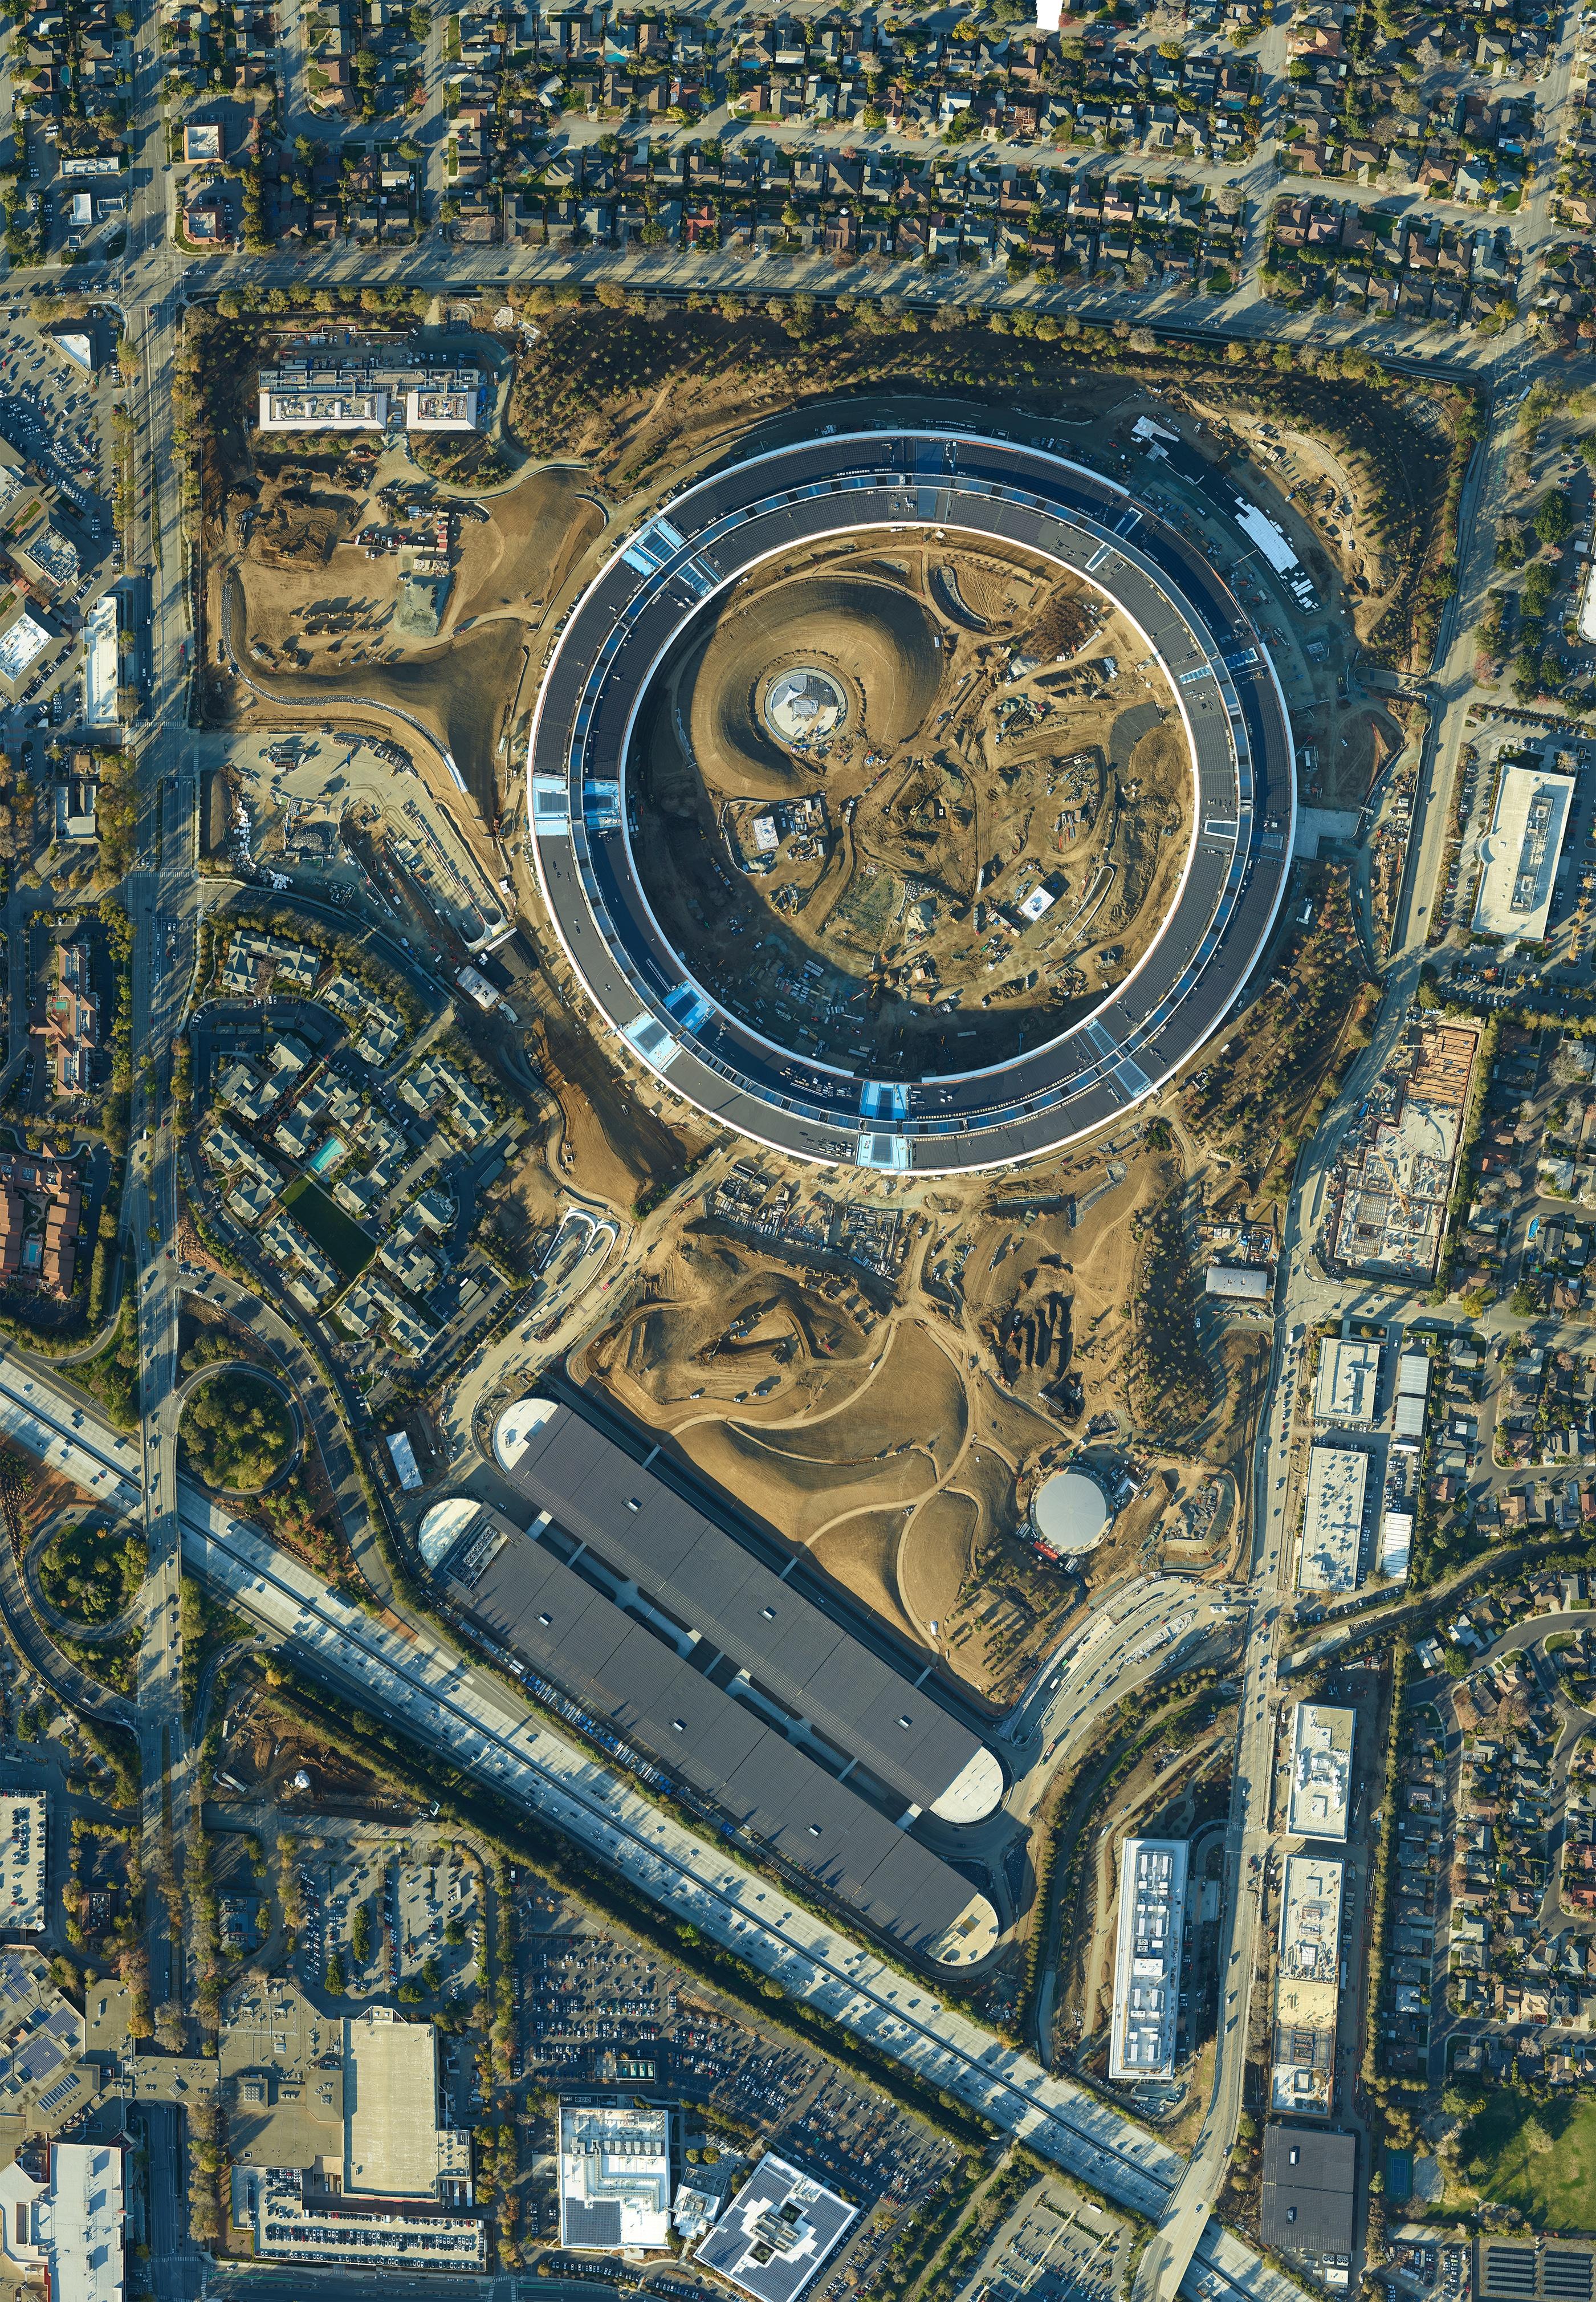 Imagem aérea do Apple Campus 2